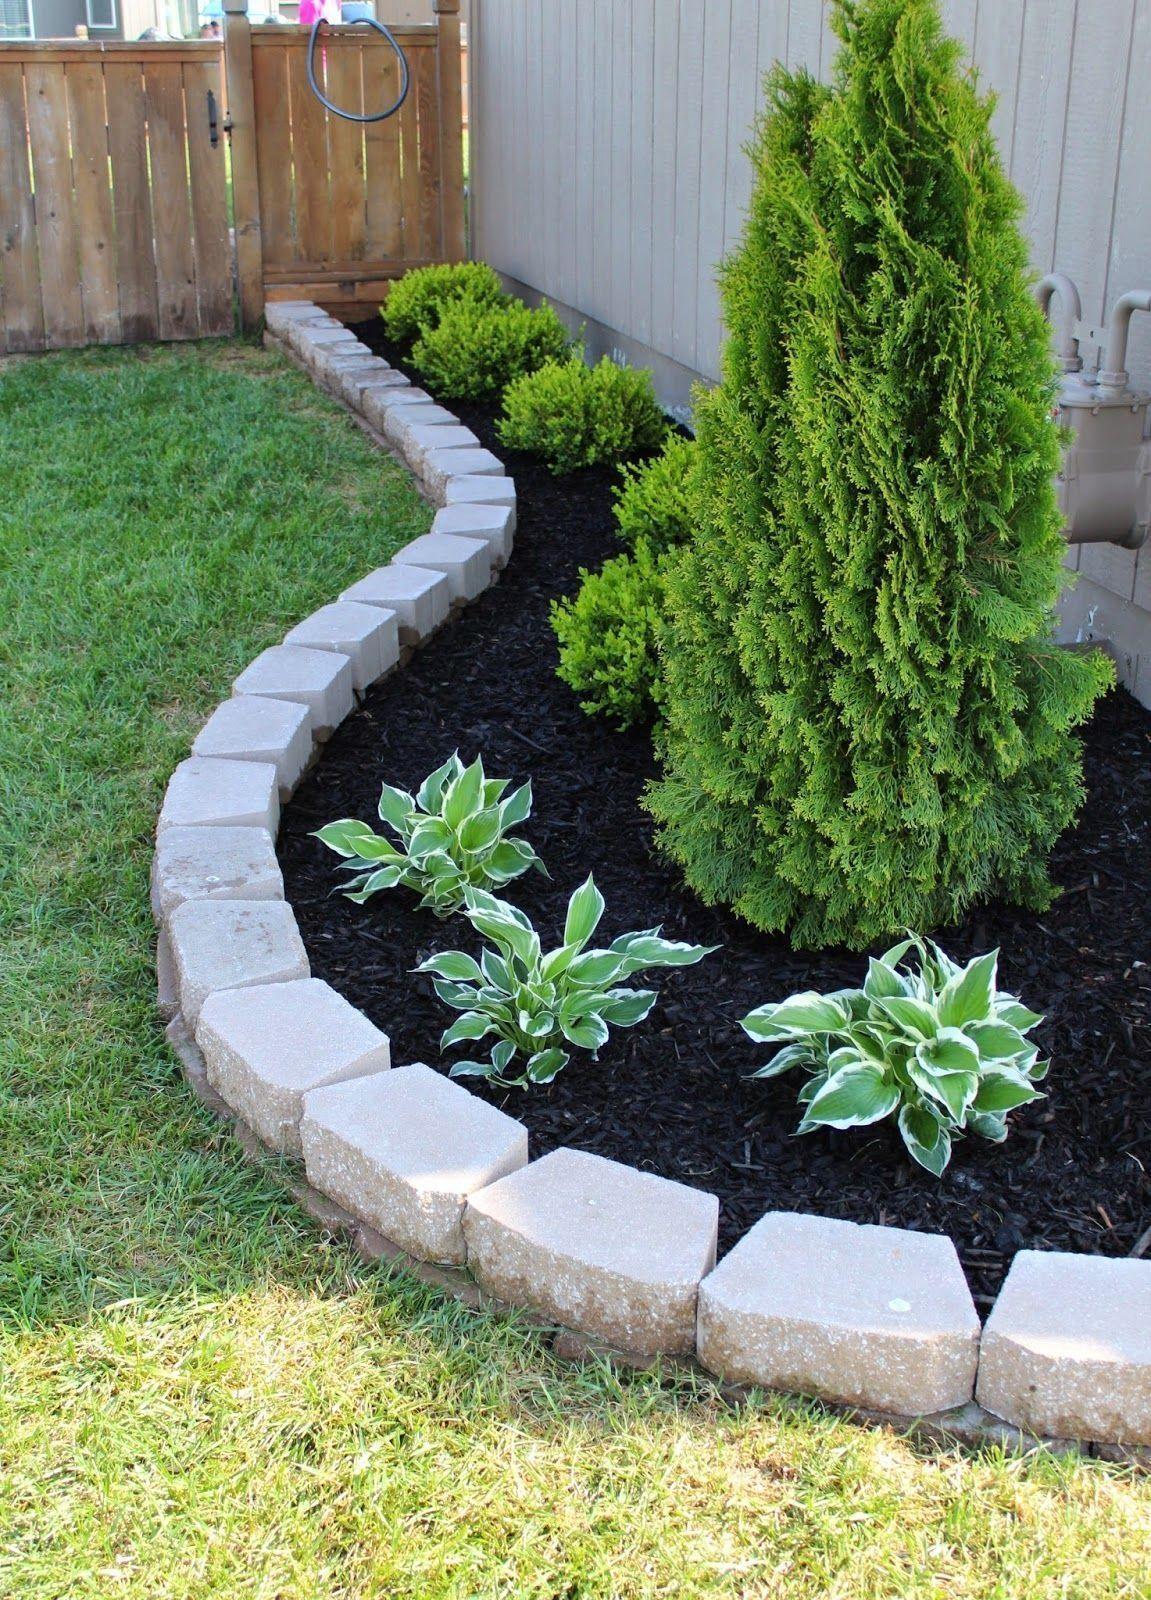 37 Easy Diy Ideas To Make Your Garden More Beautiful This Spring Easyfrontyardlandscapin Front Garden Landscape Easy Landscaping Front Yard Landscaping Design